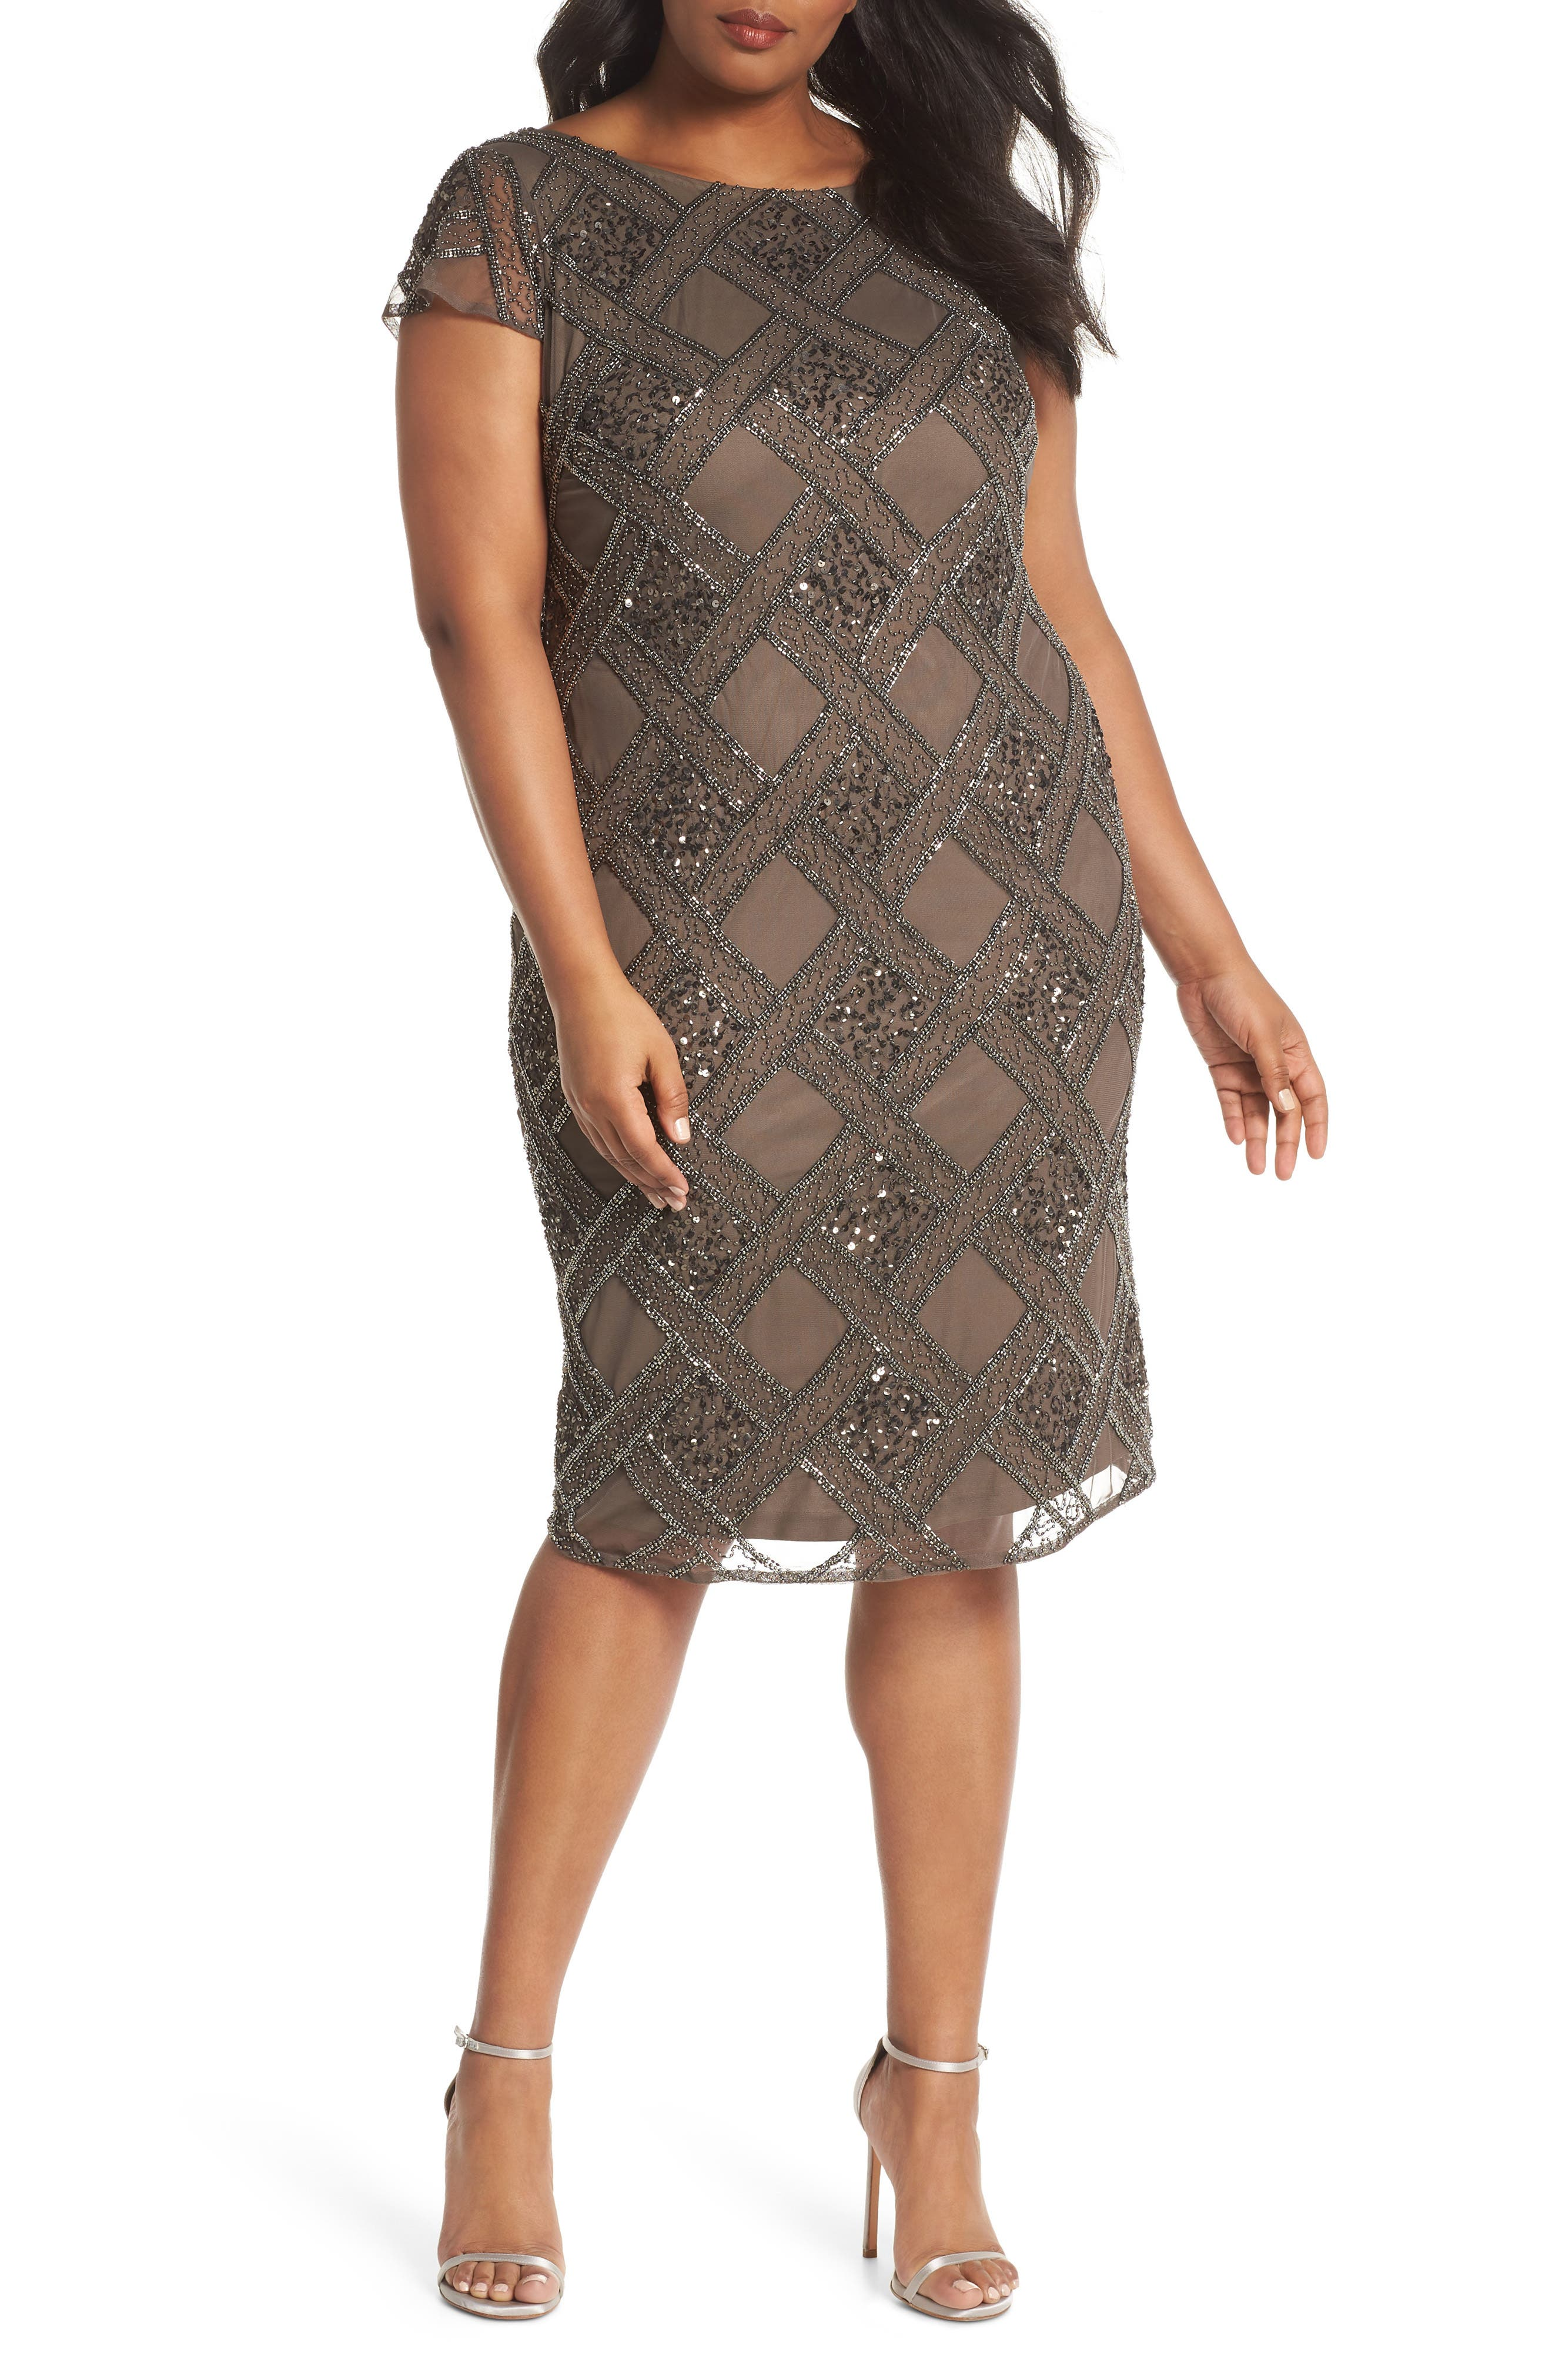 ADRIANNA PAPELL Beaded Cap Sleeve Sheath Dress, Main, color, 050